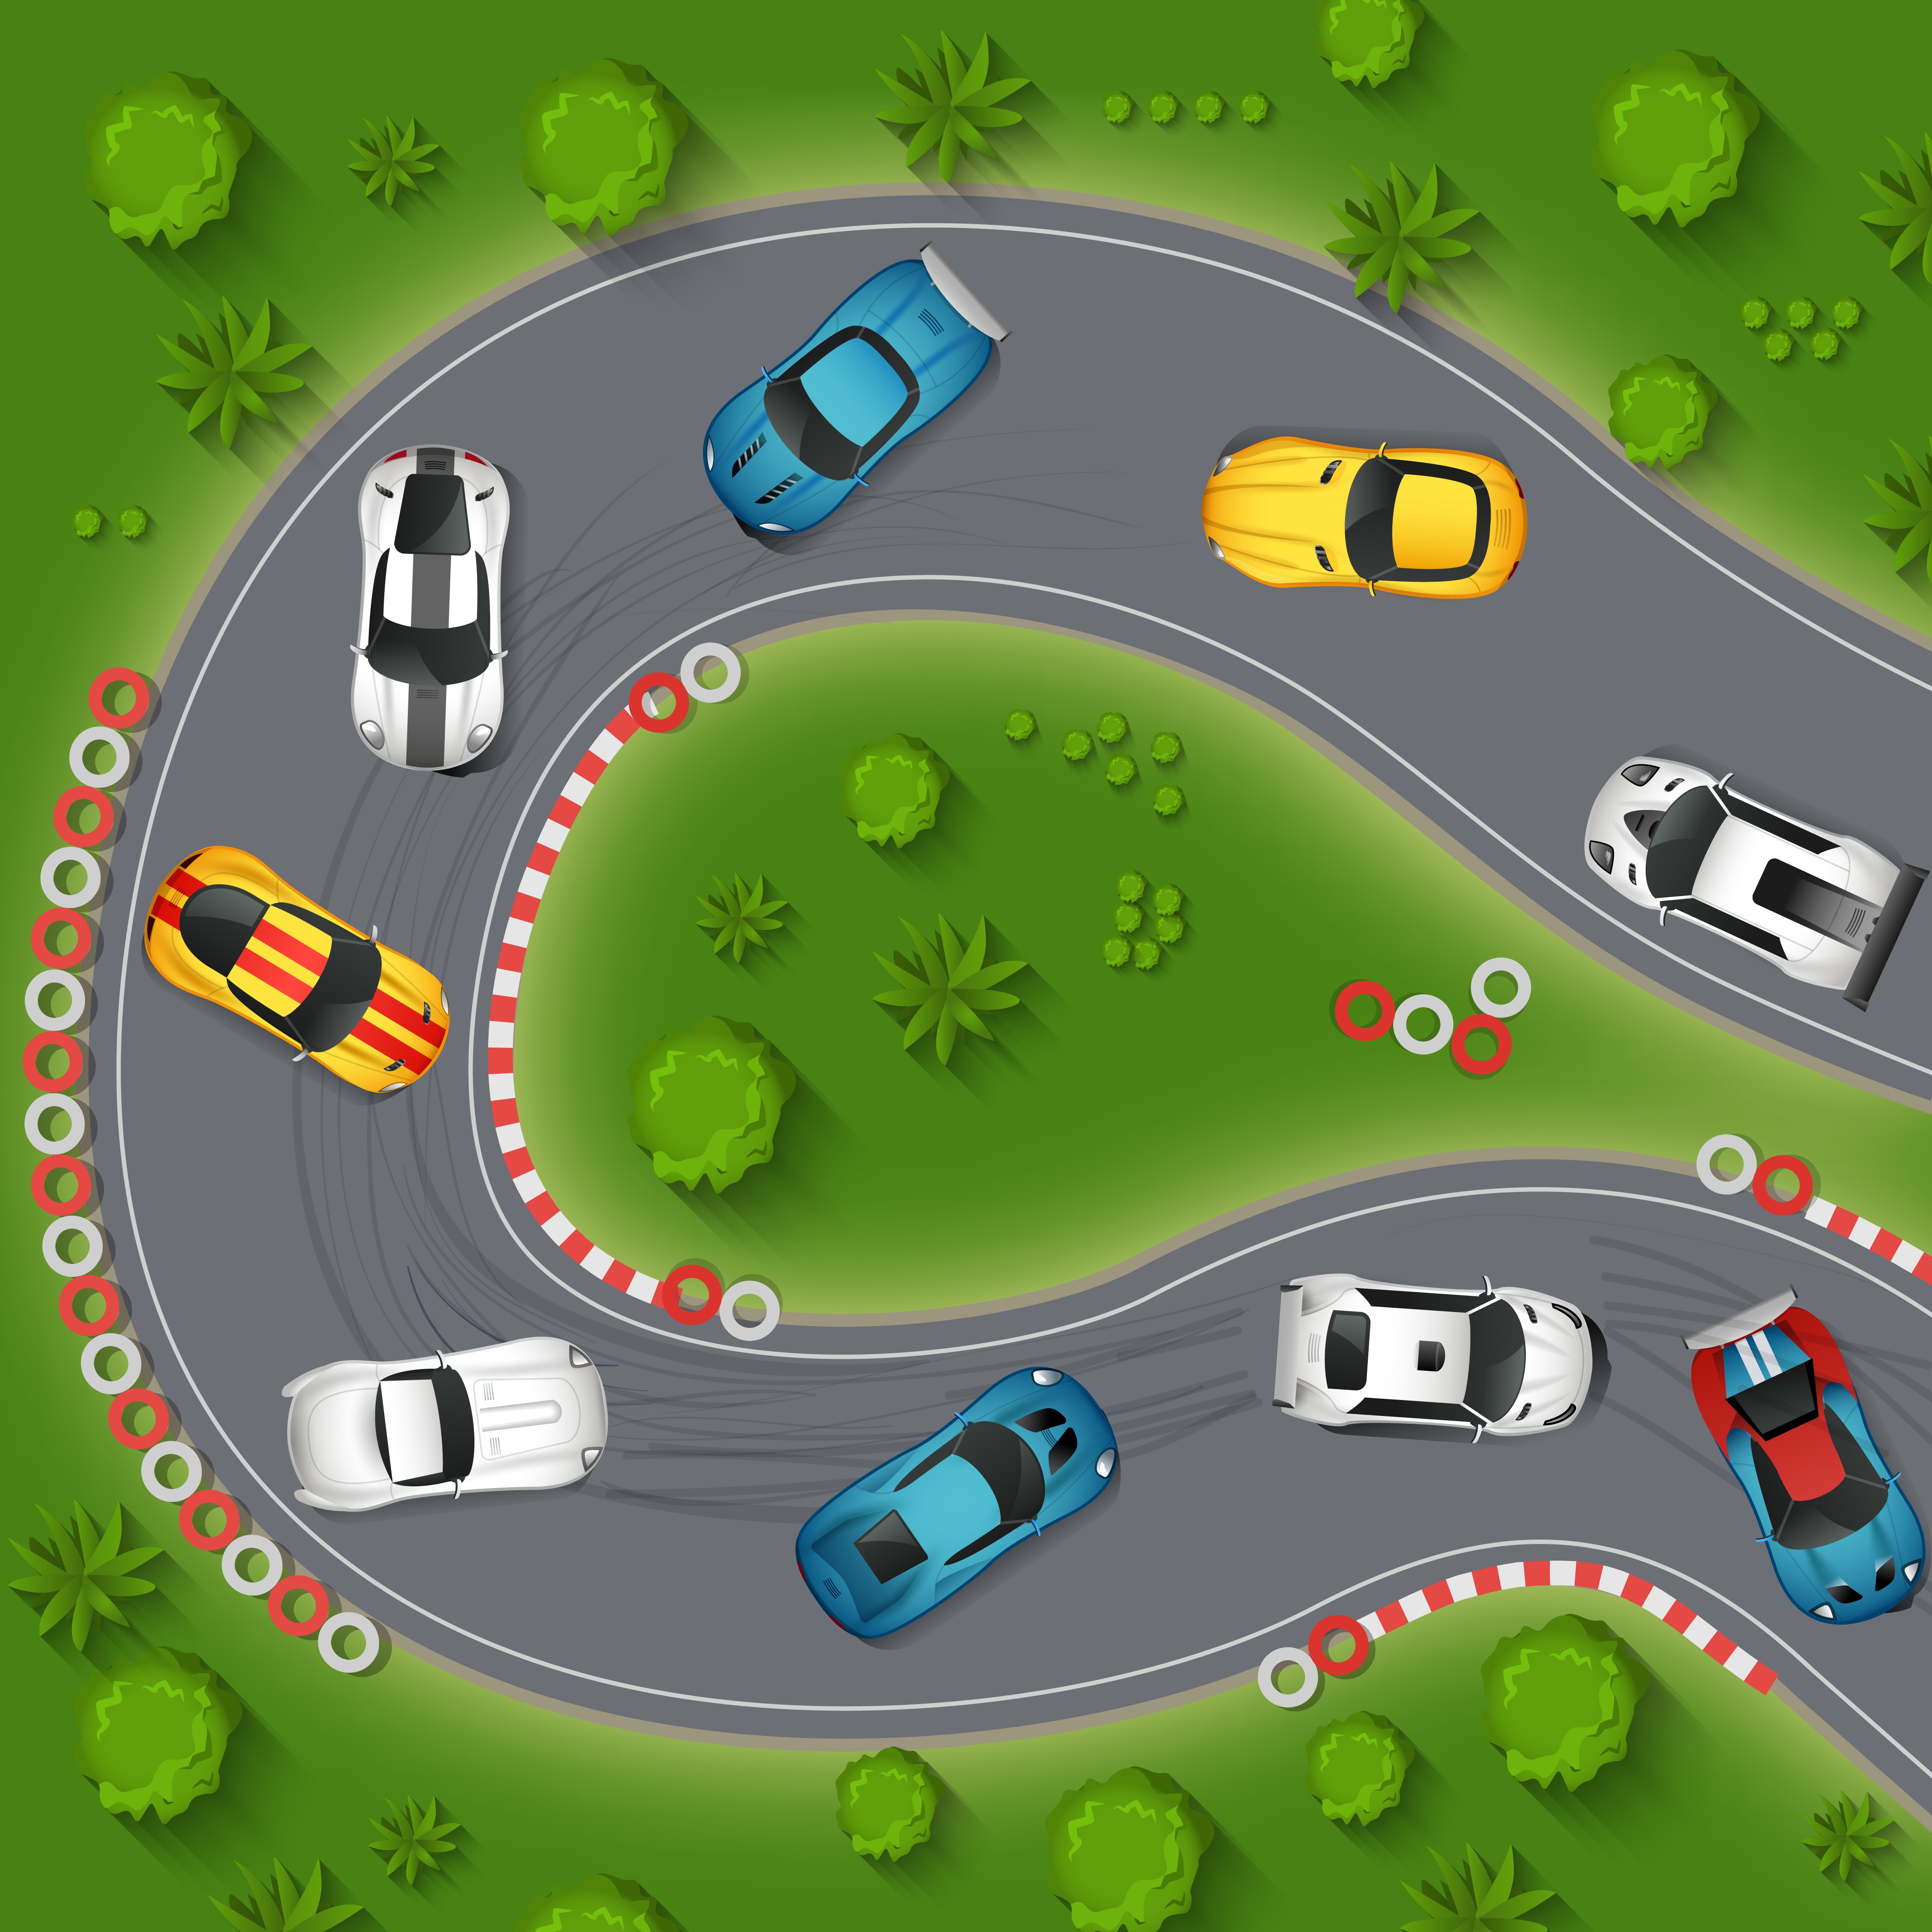 Sport Cars Drifting Top View Illustration Download Free Vectors Clipart Graphics Vector Art